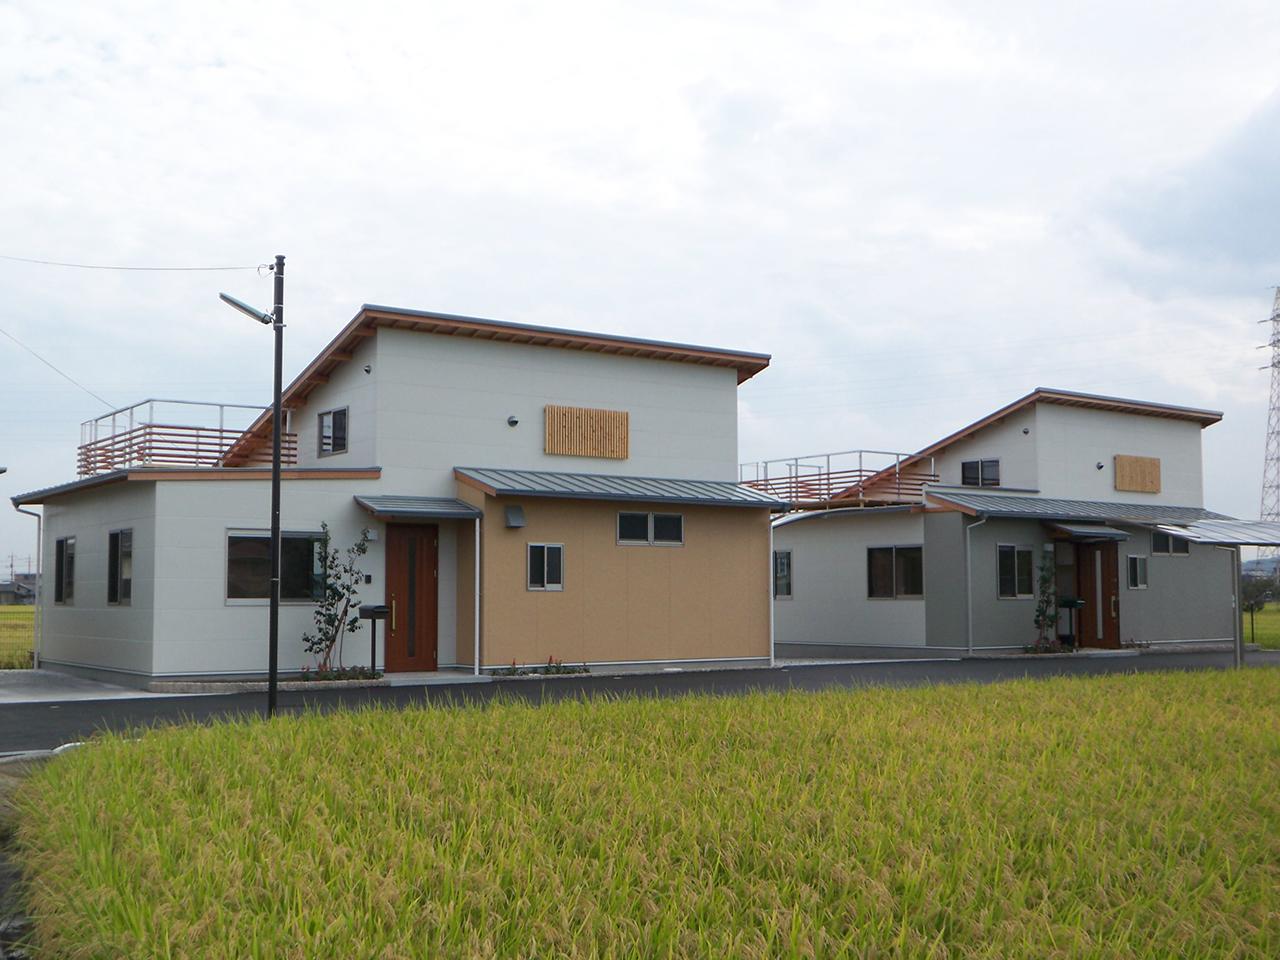 Ban's House